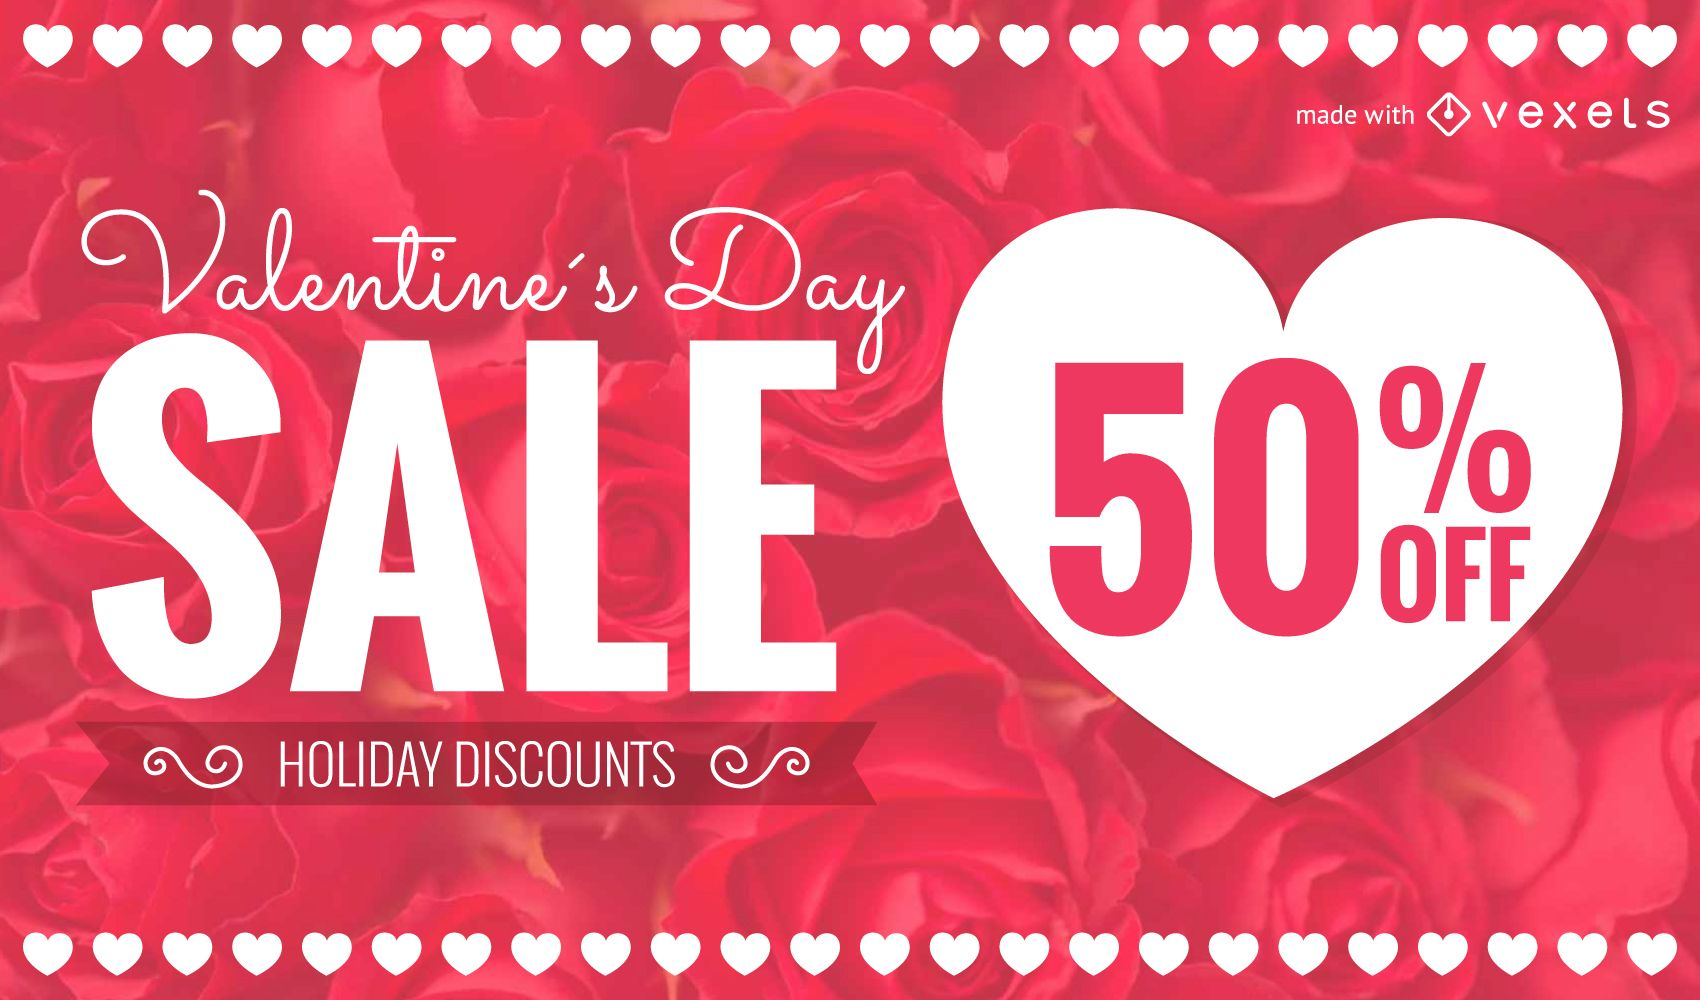 St Valentines Day sale promotion maker